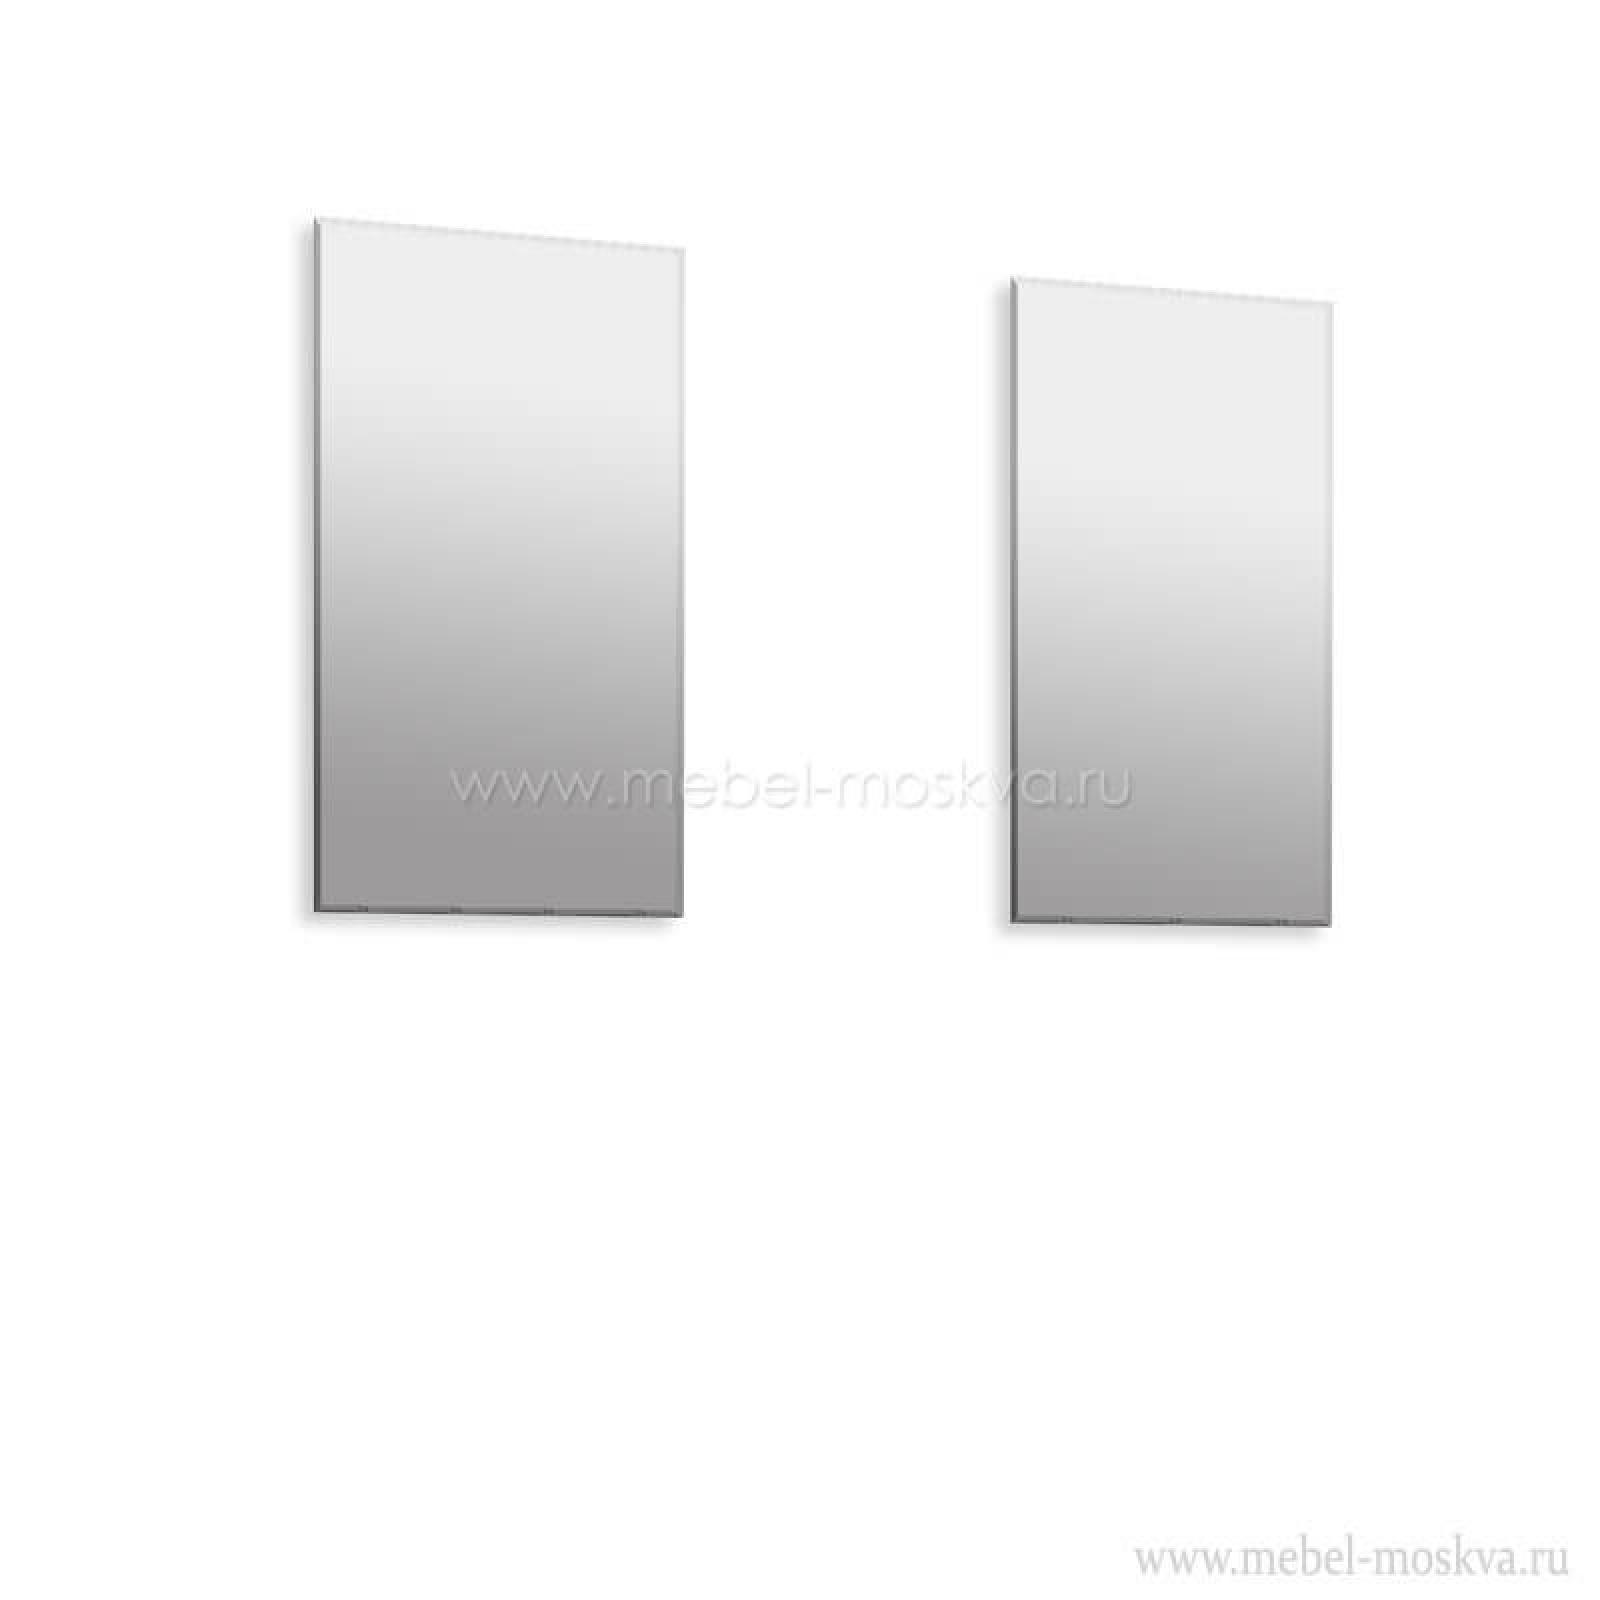 """Рапсодия Ю"" 355.4103 К-т зеркал 2 шт. для 355.41 - 1"